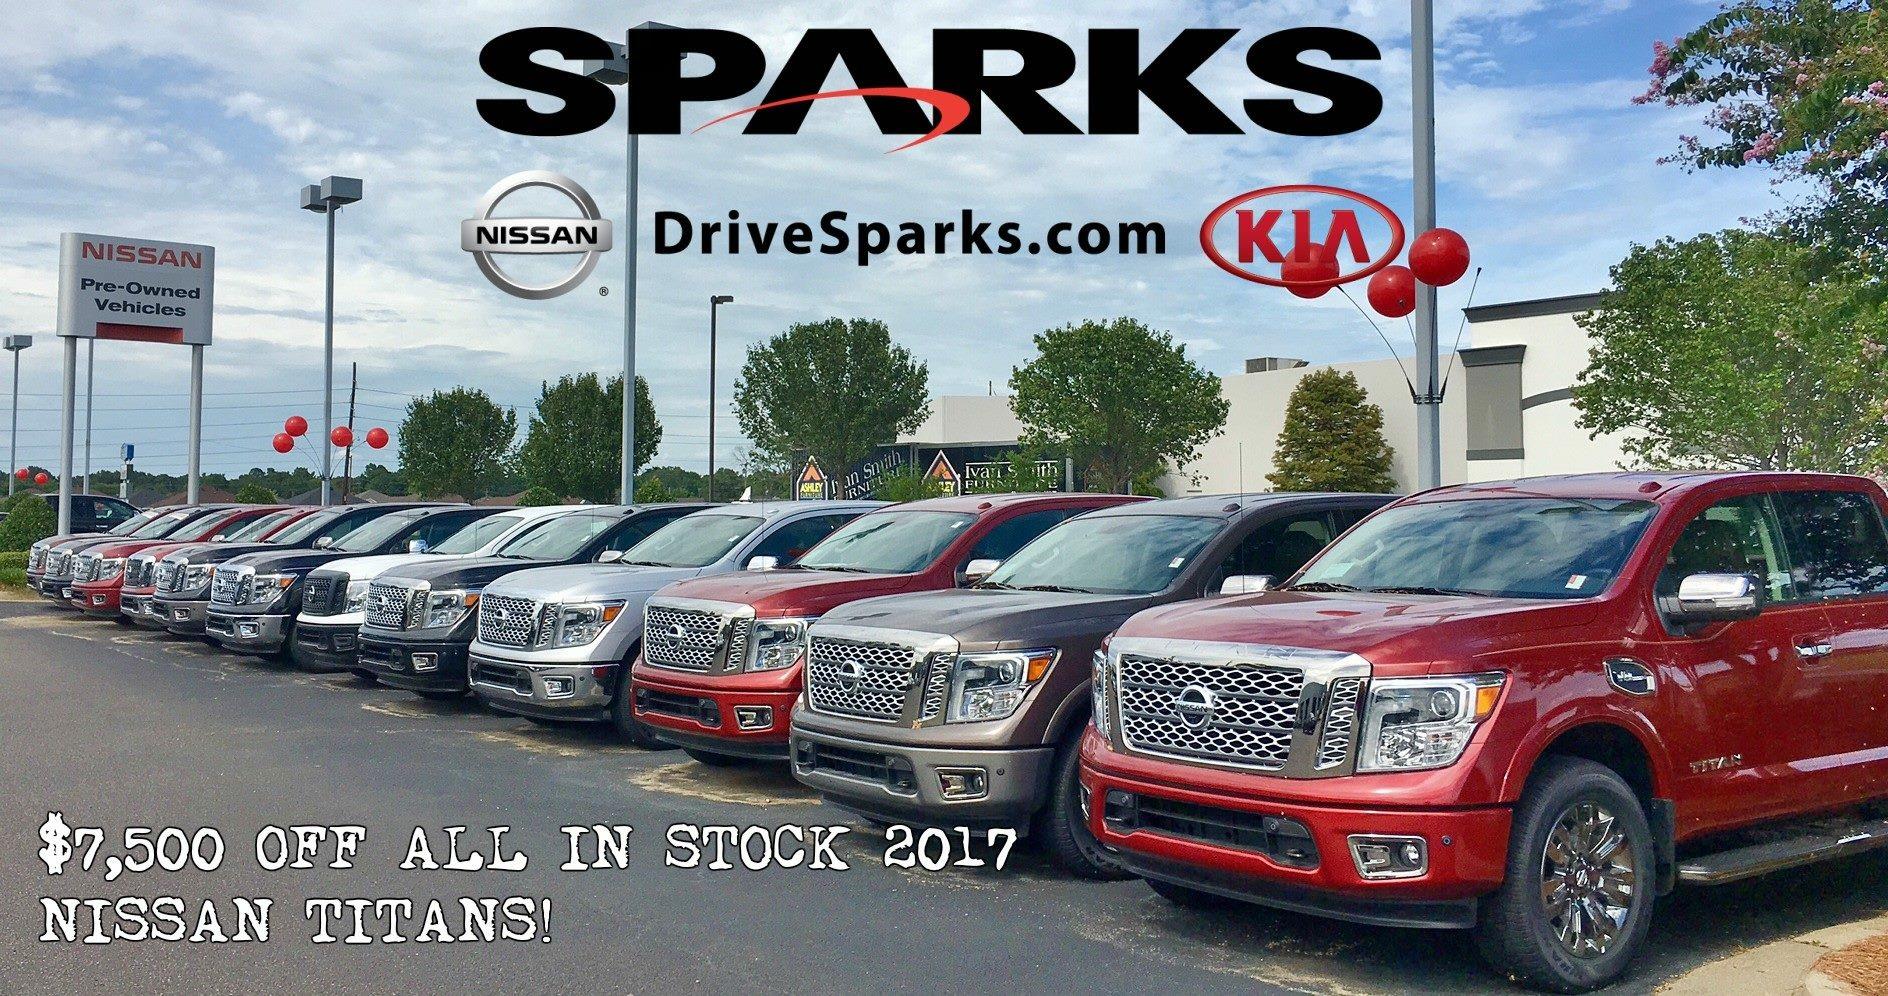 Sparks Nissan Kia Monroe La. Department Of Motor Vehicles Monroe La Hours  Caferacer 1firts Com